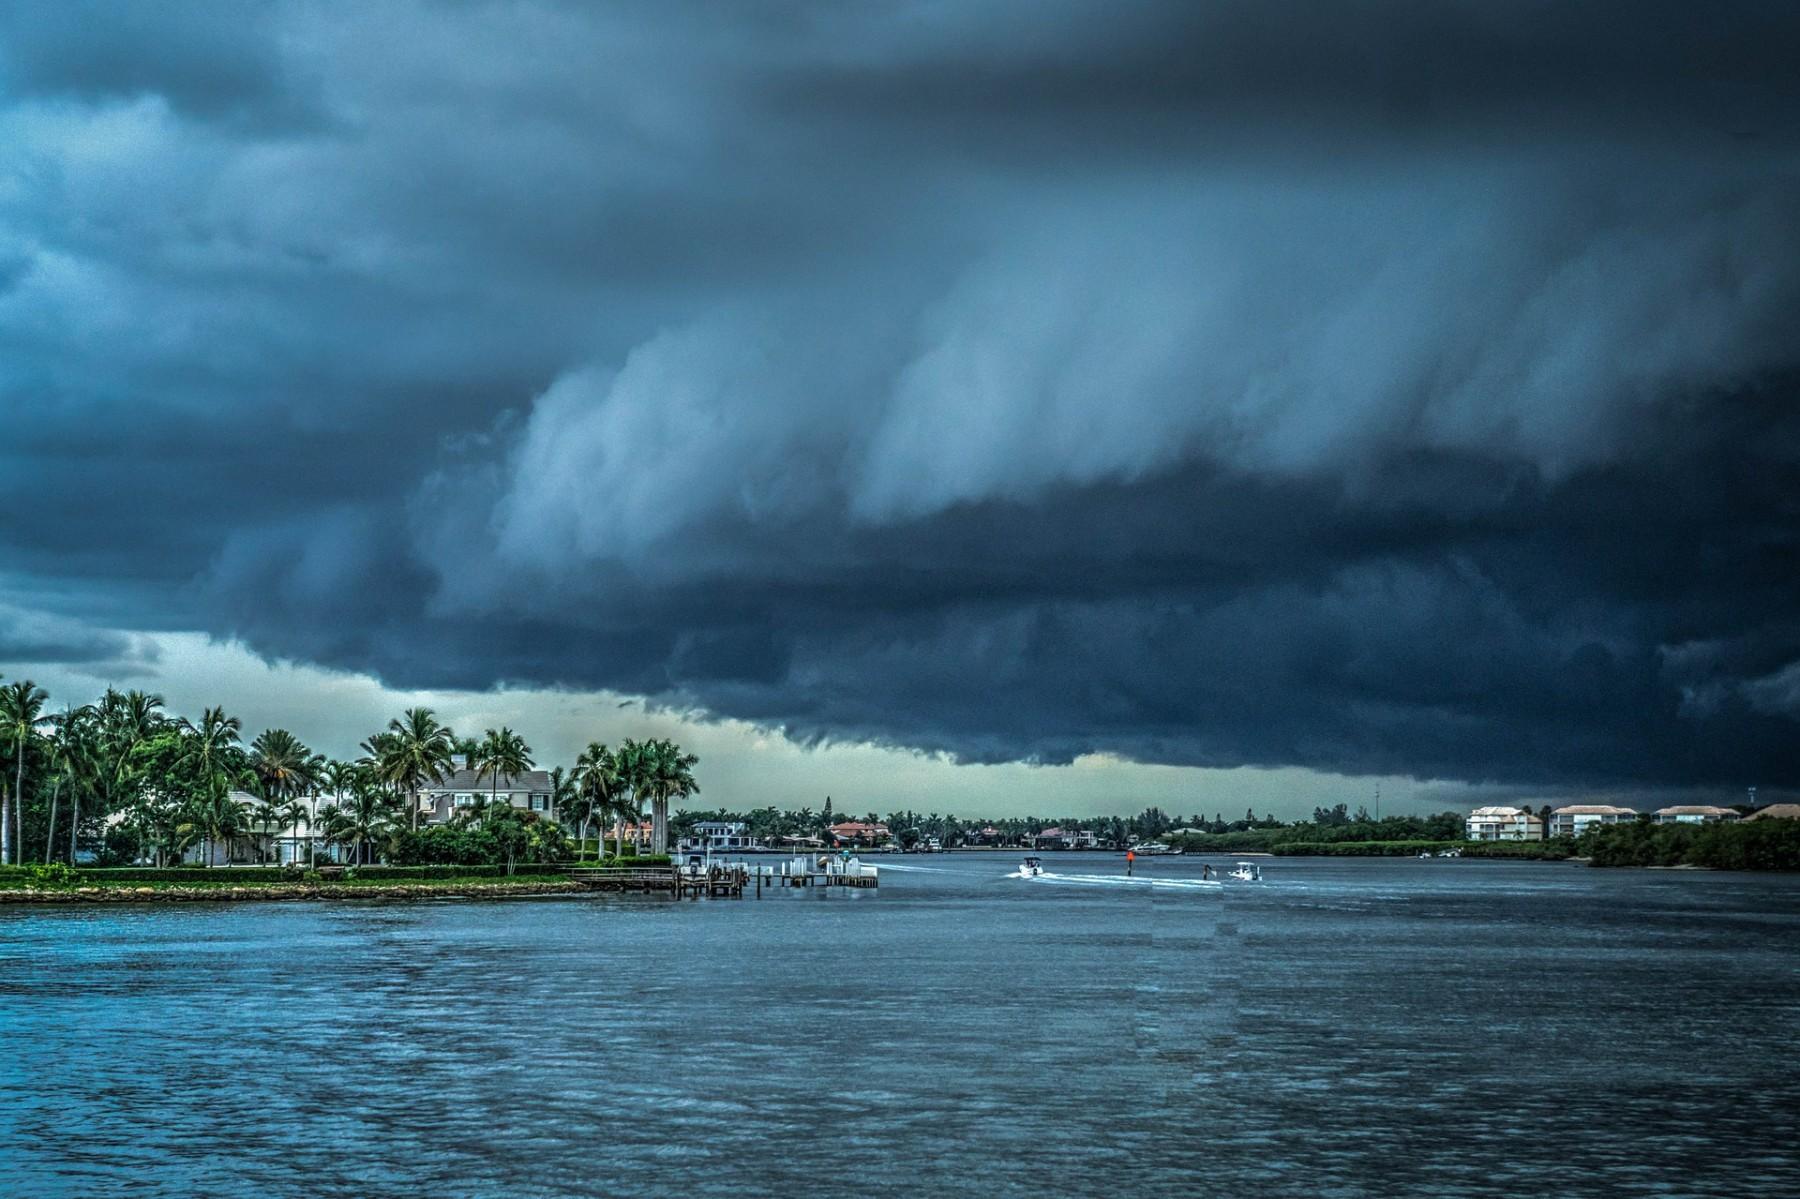 storm-407963_1920 (1)